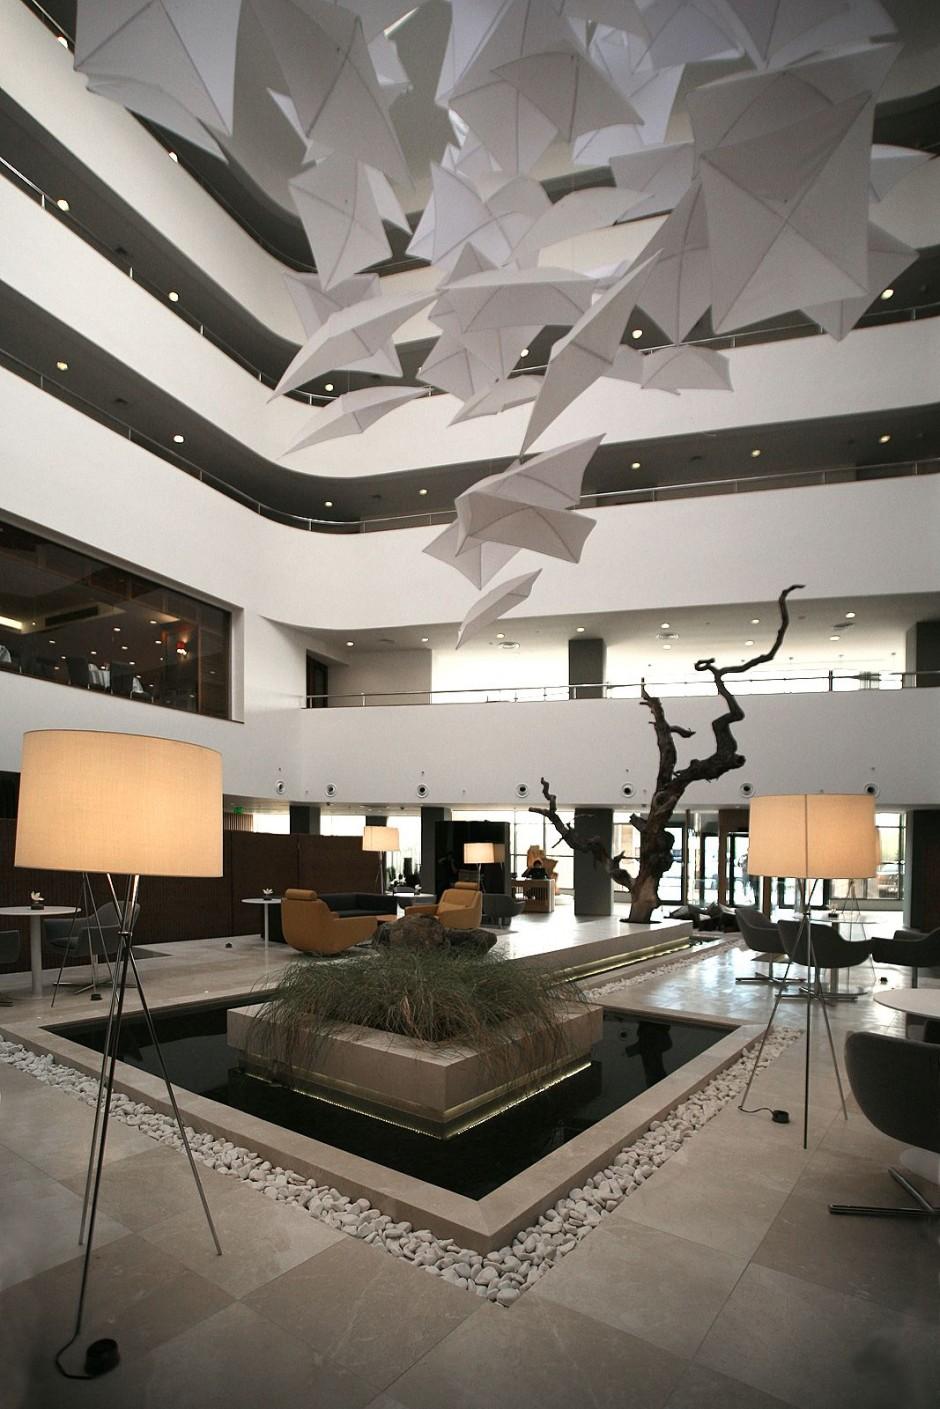 Hogares frescos lobby del hotel radisson por tanju zelgin for Diseno de interiores hoteles